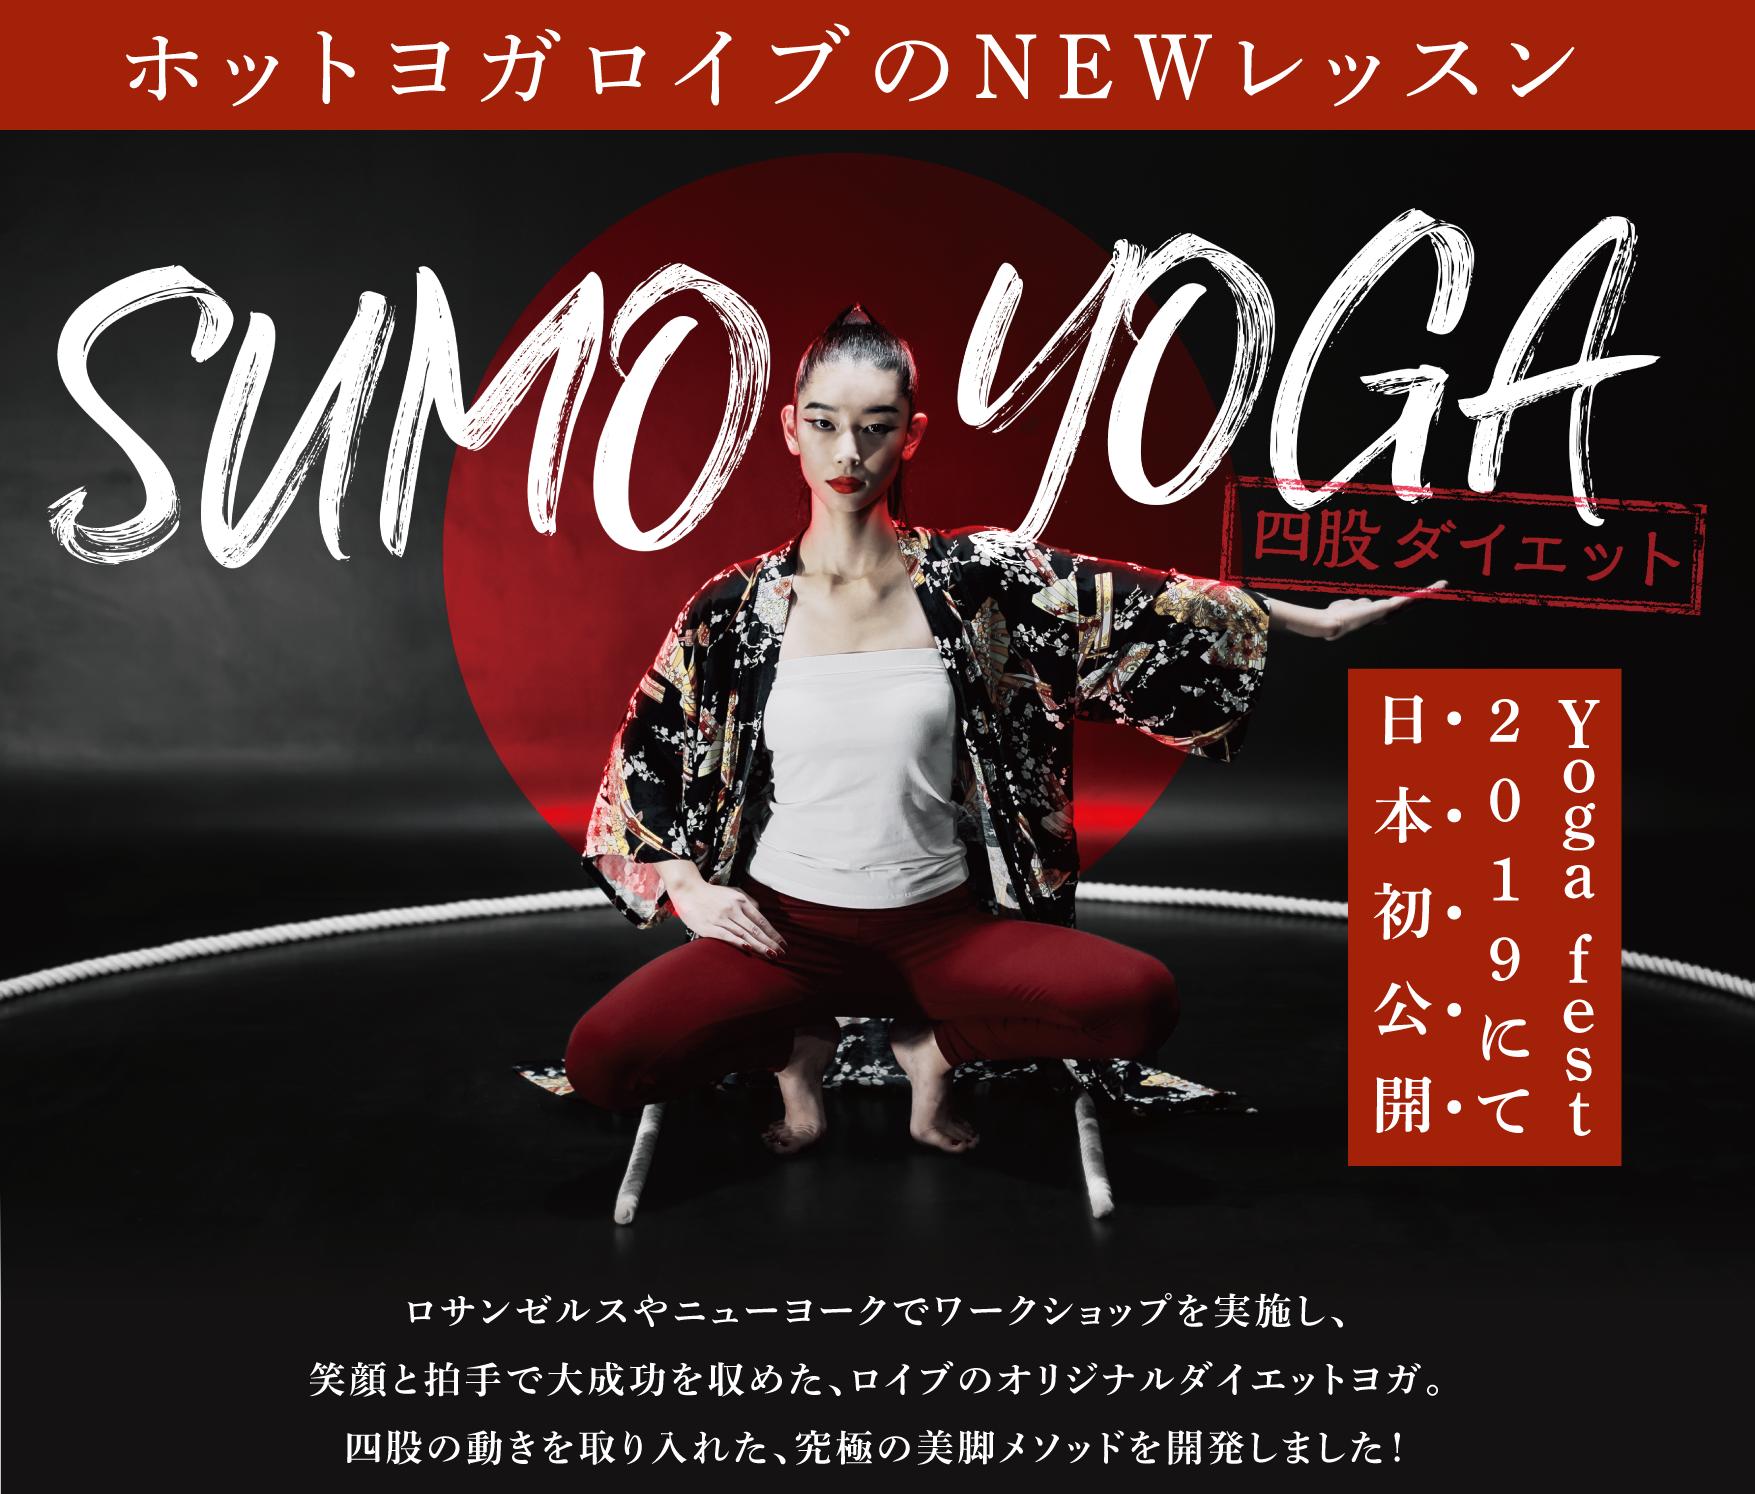 SUMO YOGA 9月15日(日)「ヨガフェスタ横浜2019」にて日本初公開!